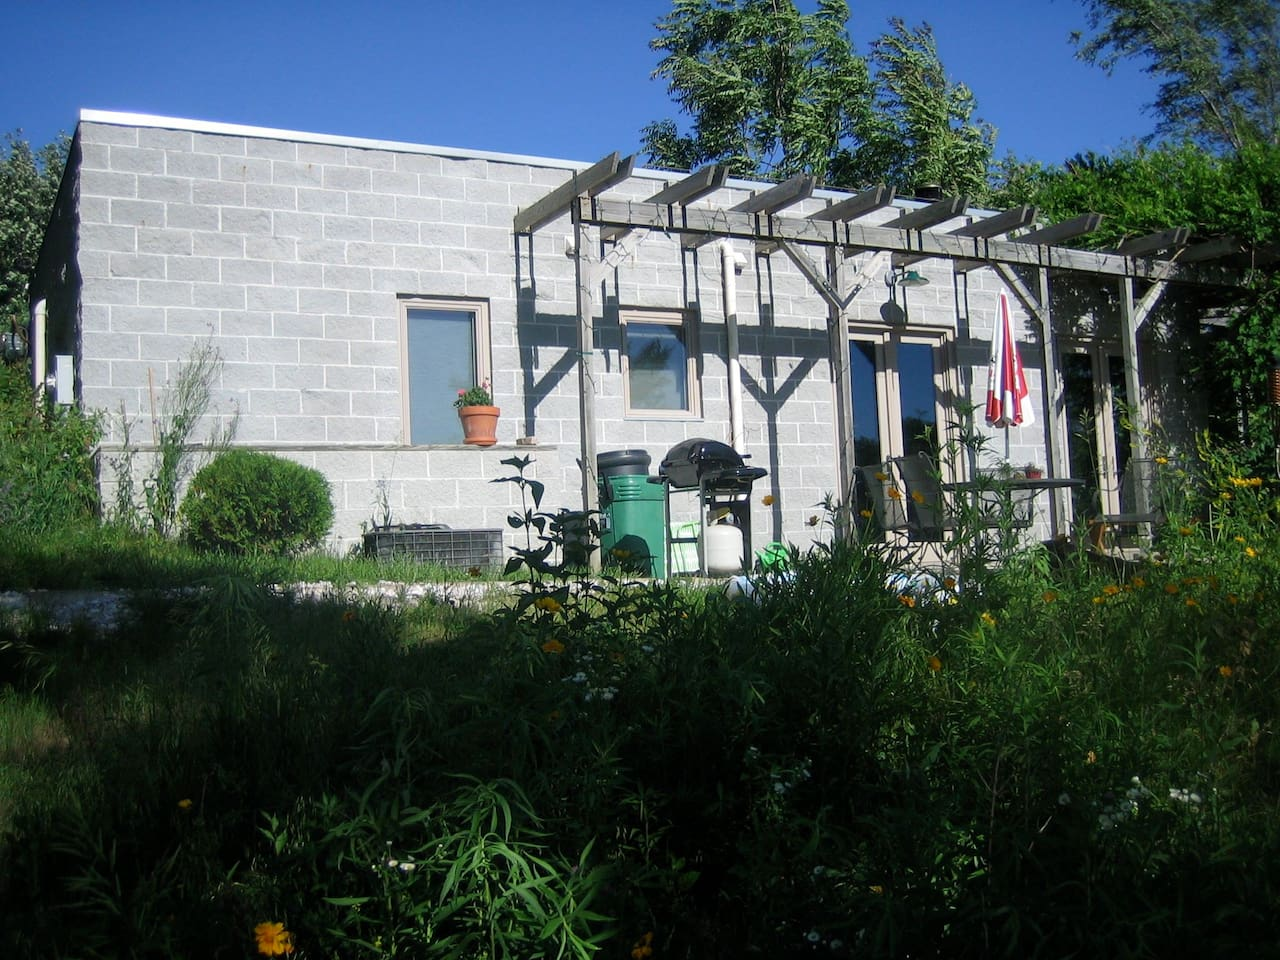 Exterior of Sundowners, facing West